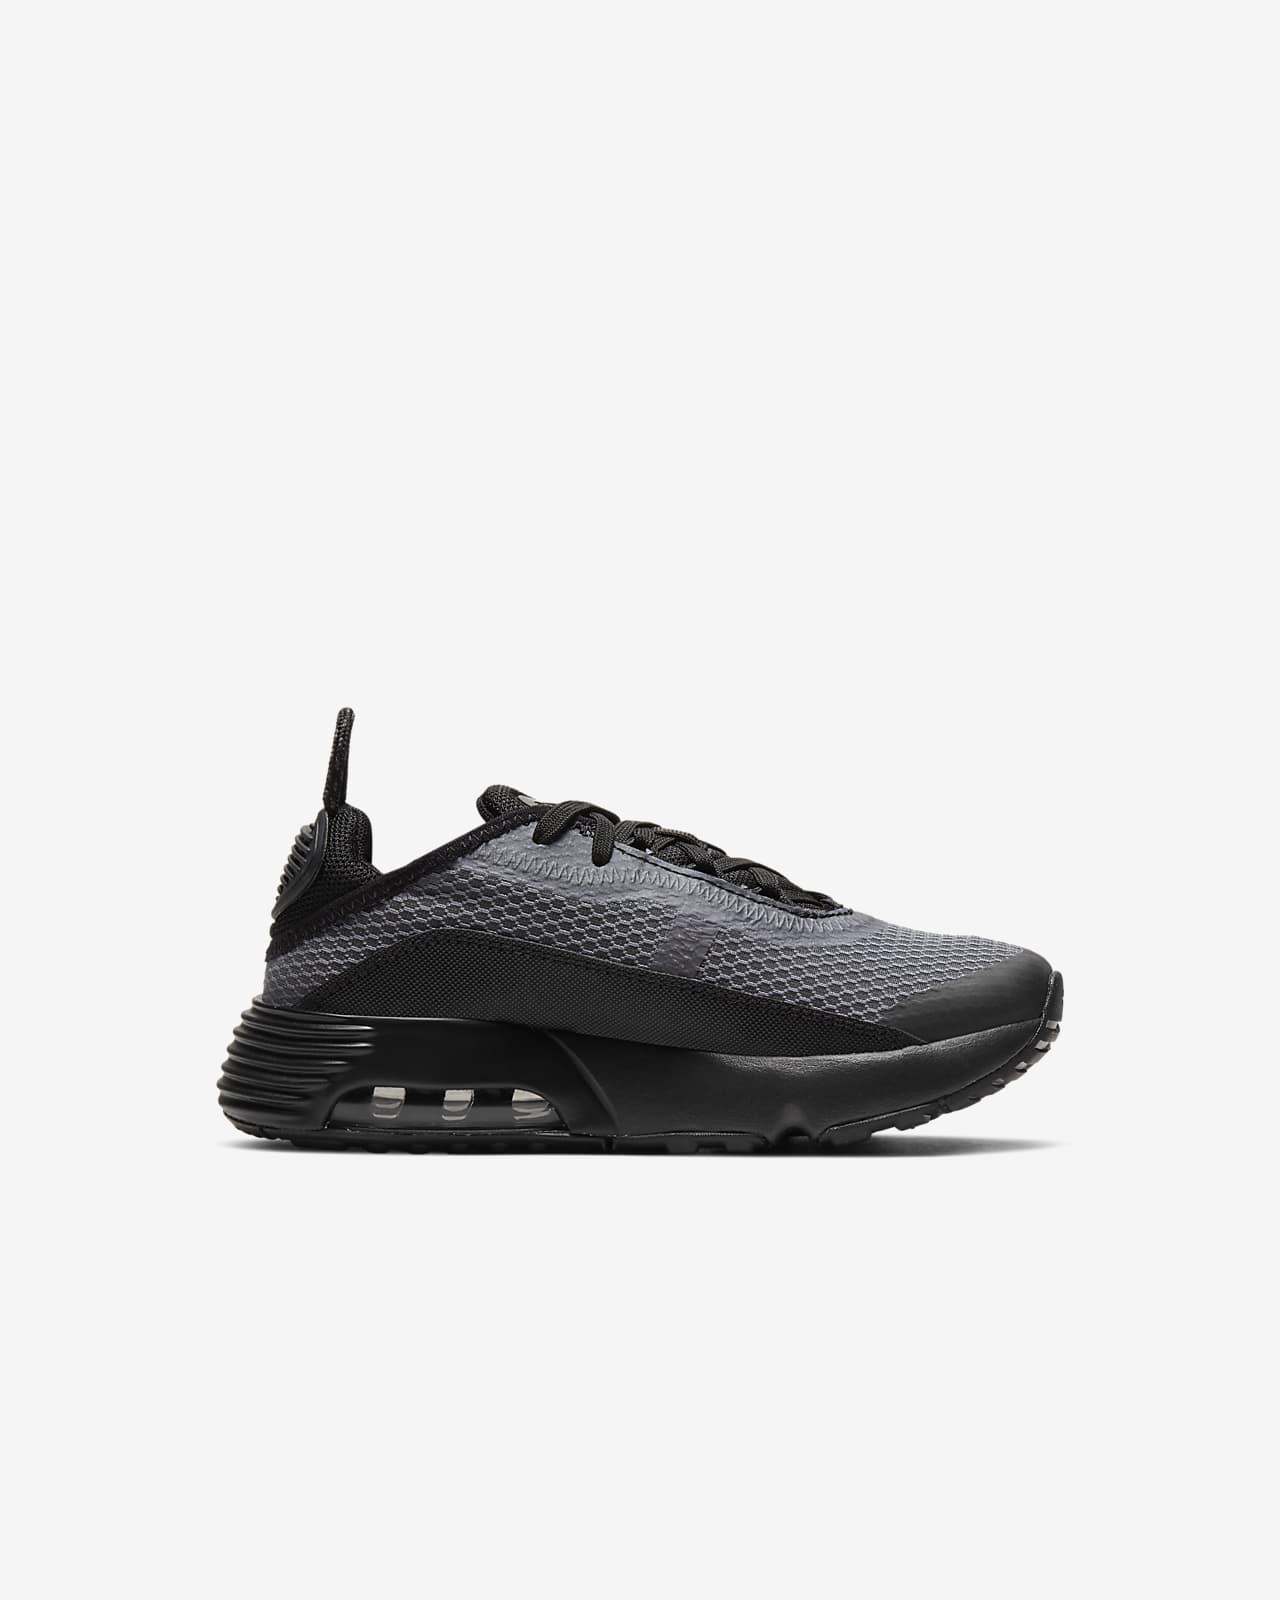 Chaussure Nike Air Max 2090 pour Jeune enfant. Nike LU